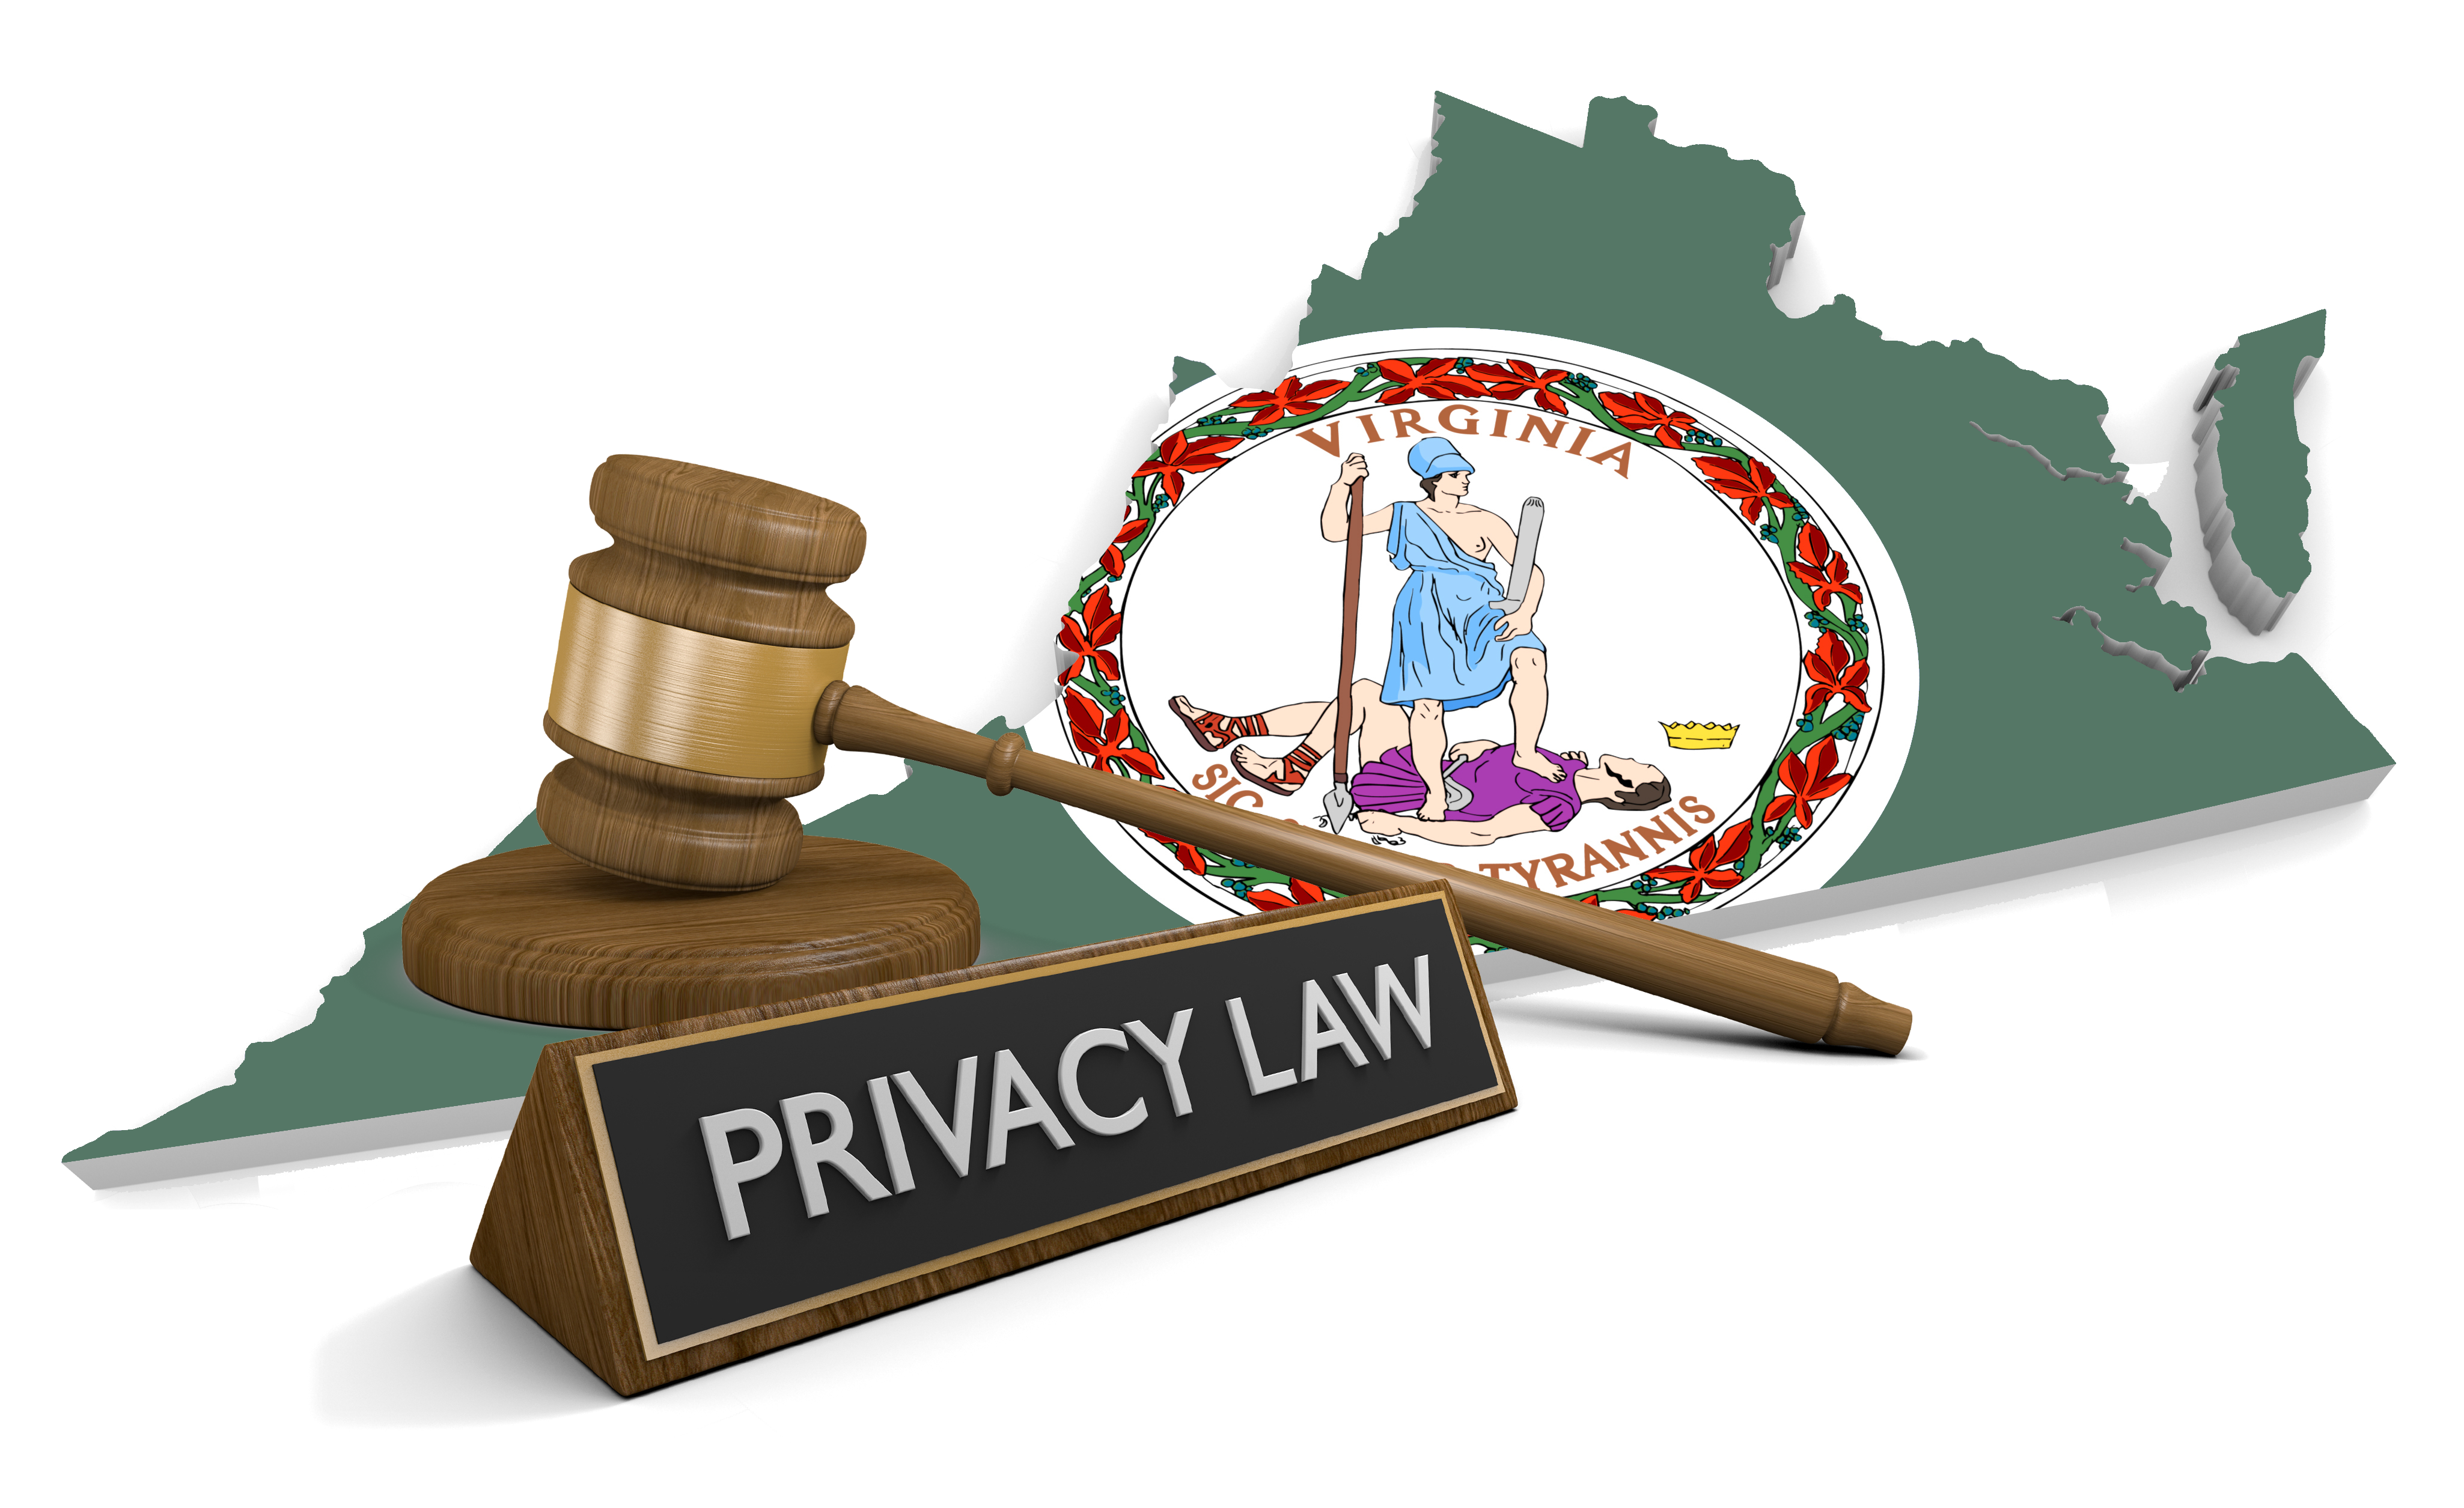 Virginia Privacy Law Image_03.24.2021